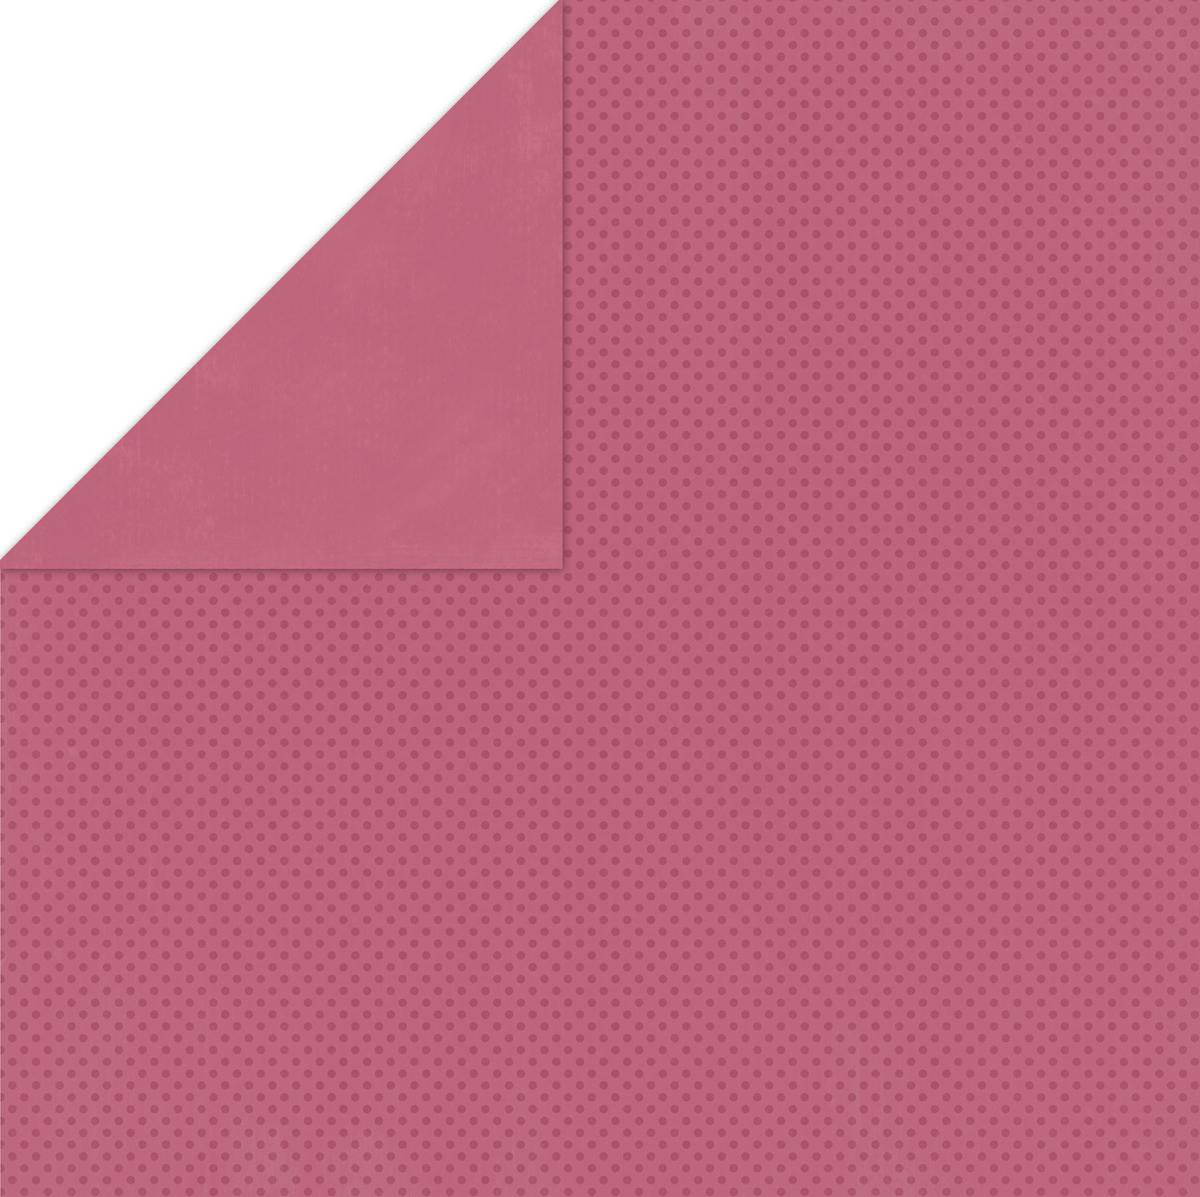 BoBunny Double Dot Double-Sided Textured Cardstock 12X12-Raspberry